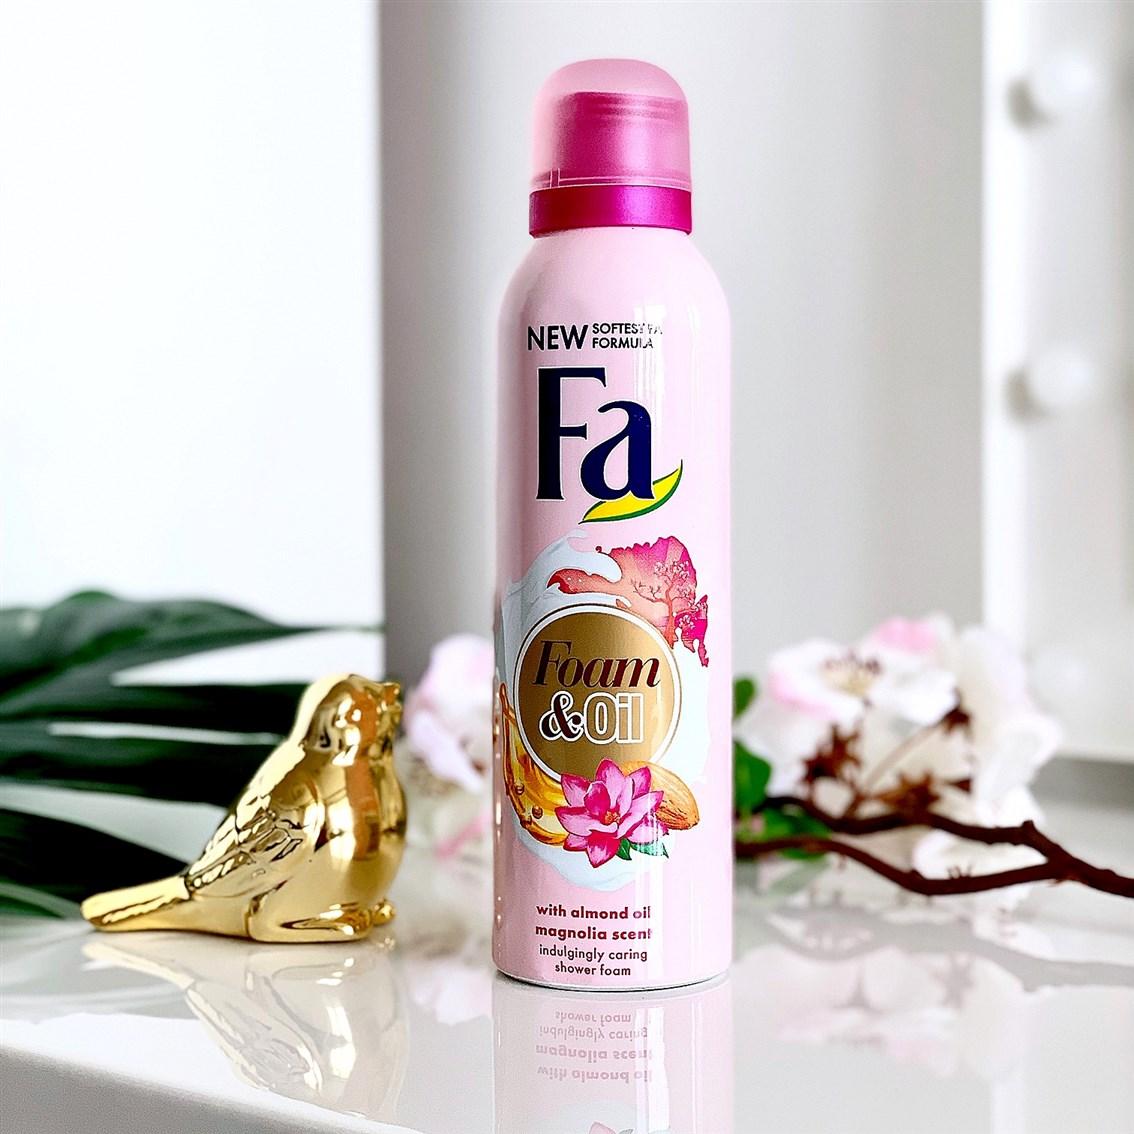 FA Foam & Oil Magnolia opinie